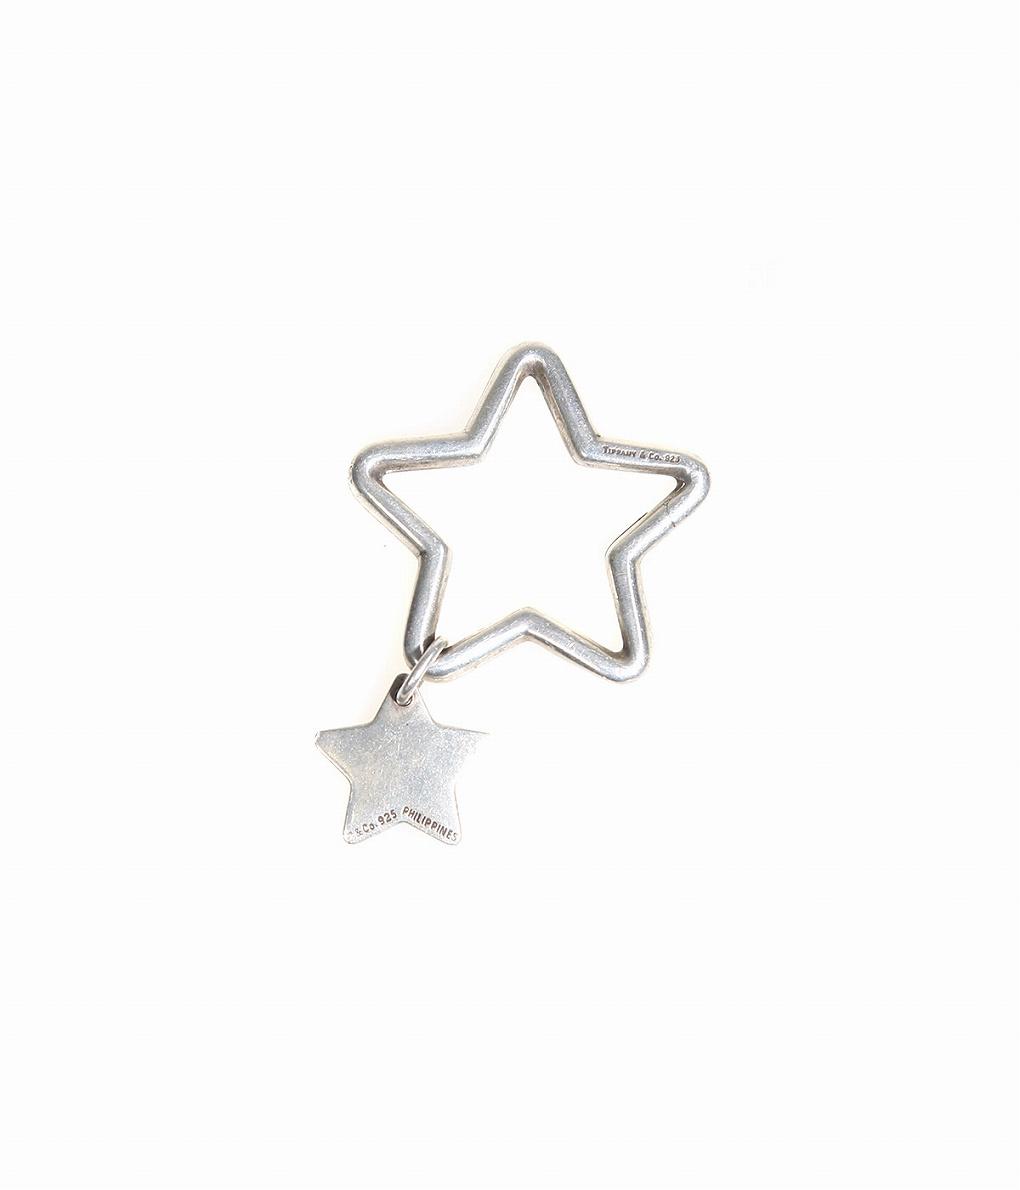 VINTAGE / ヴィンテージ : VINTAGE TIFFANY STAR KEYRING : ヴィンテージ ティファニー アクセサリー アンティーク シルバー キーリング クリスマス クリスマスプレゼント : VT-TF-STAR-KR【VIN】